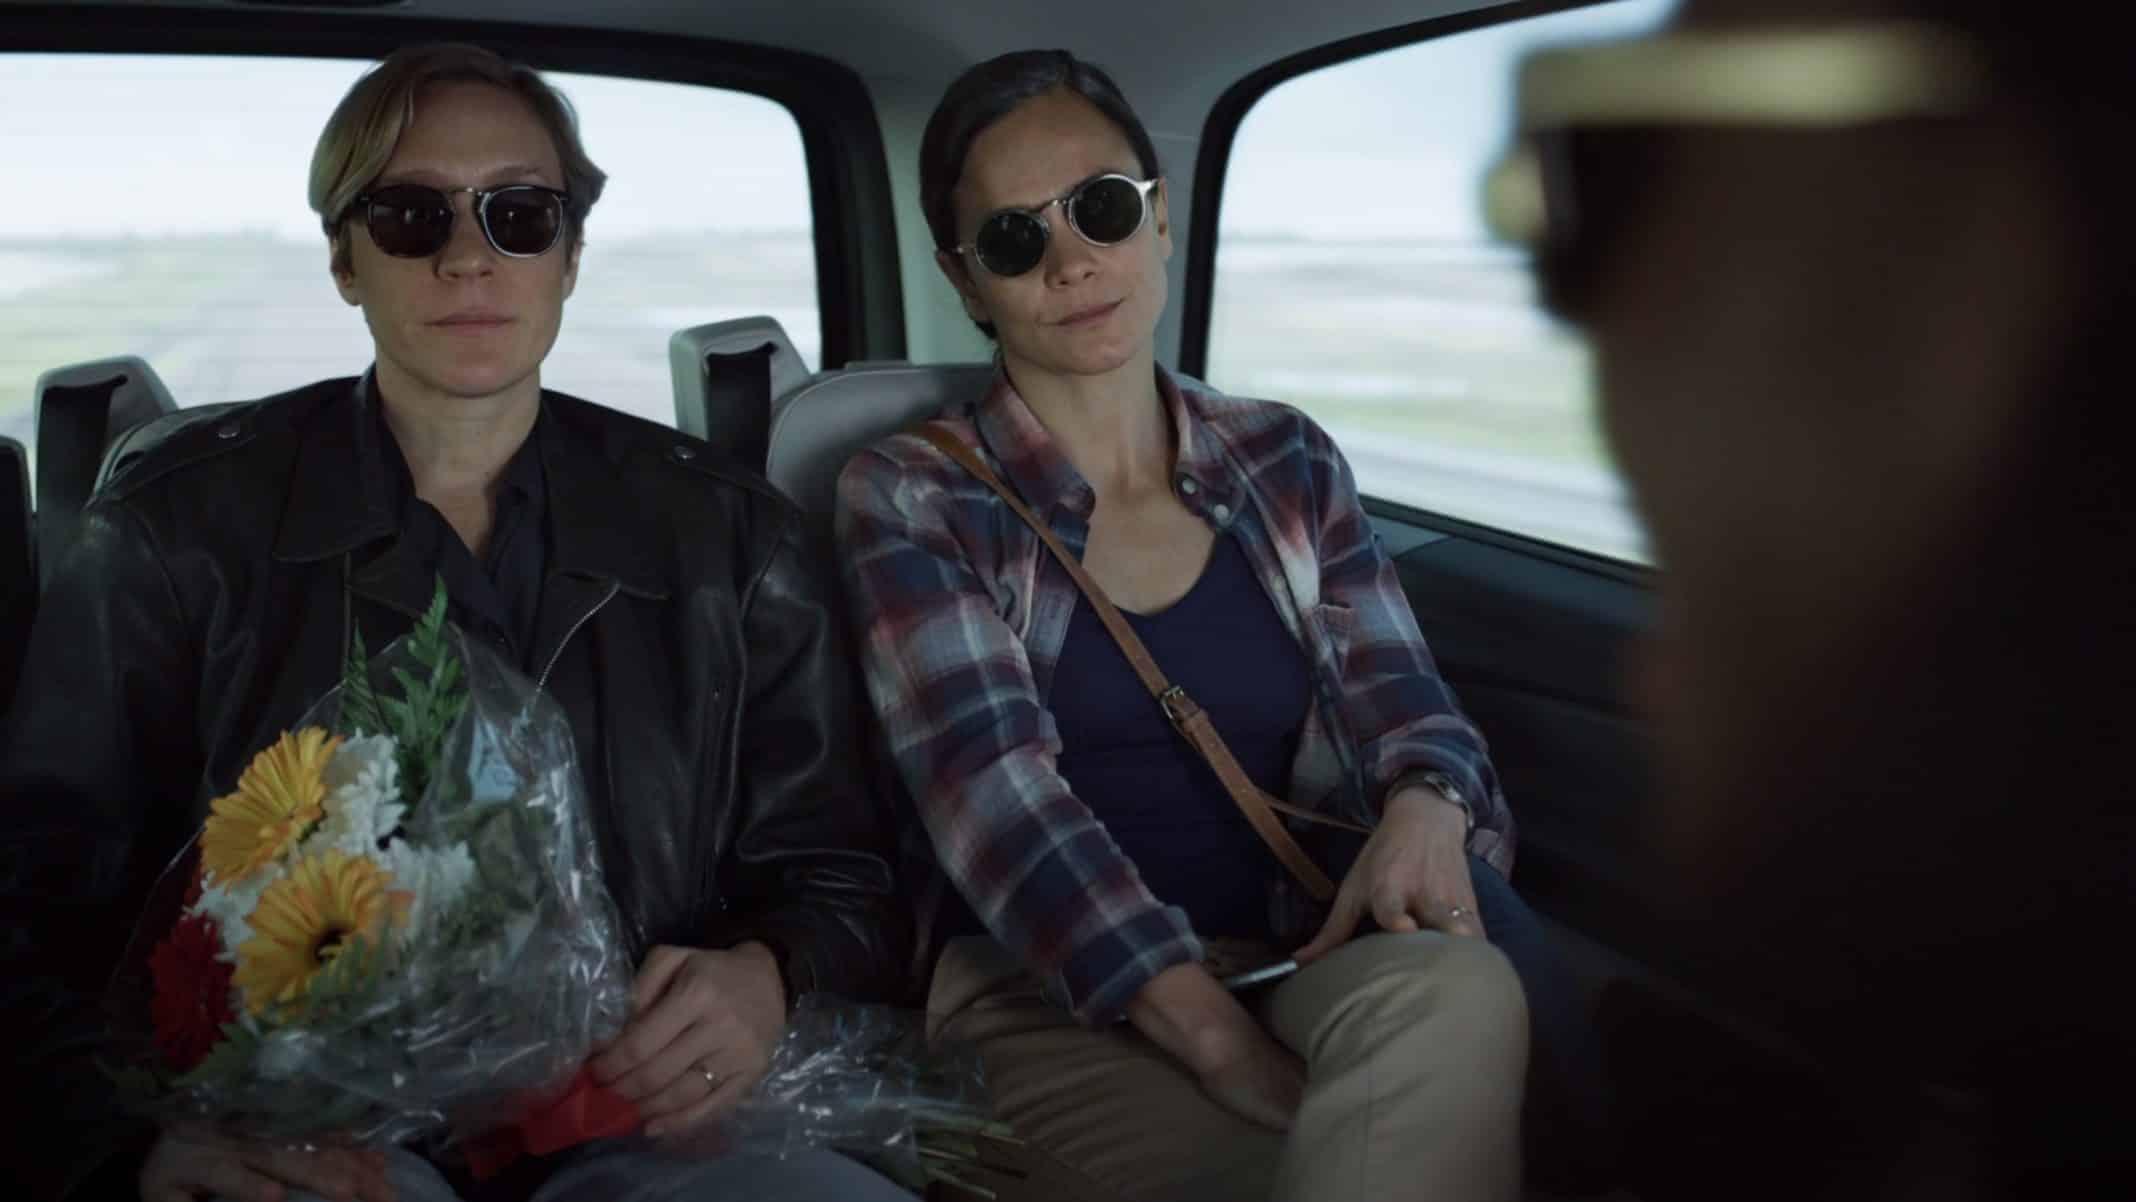 Sarah (Chloe Sevigny) and Maggie (Alice Braga) on their way to the base.